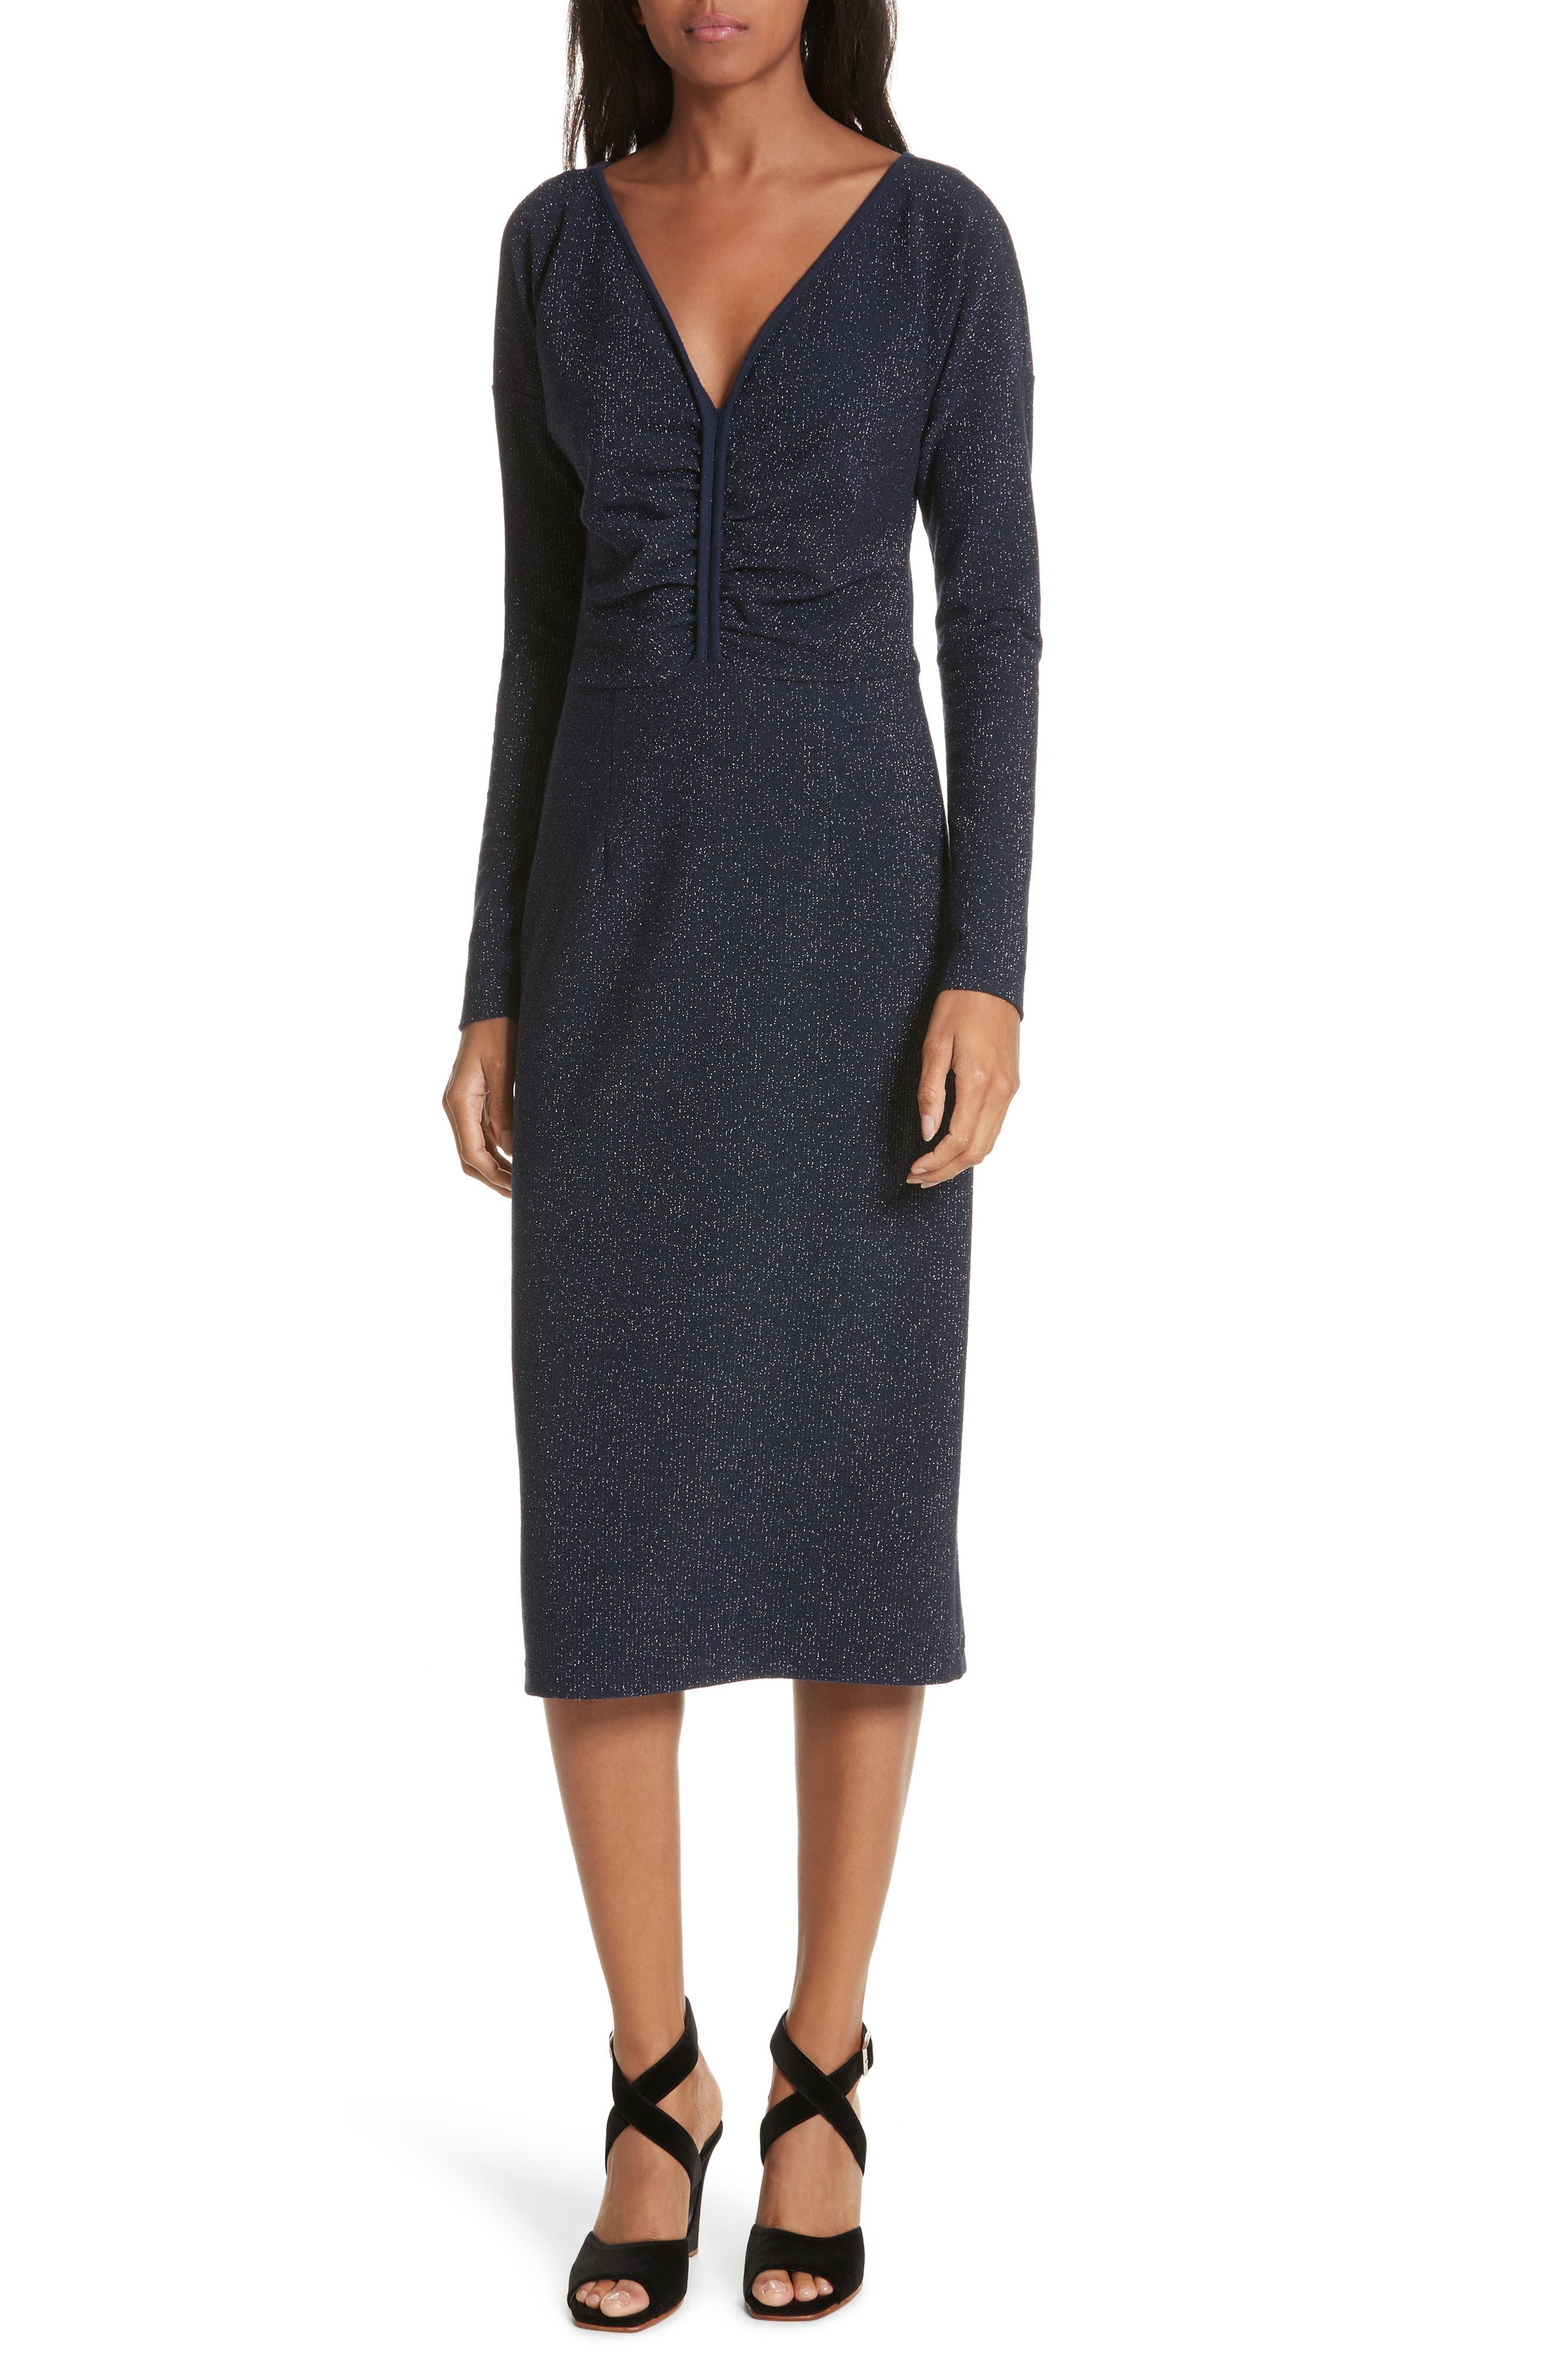 Temper Metallic Knit Dress,                             Main thumbnail 1, color,                             Navy